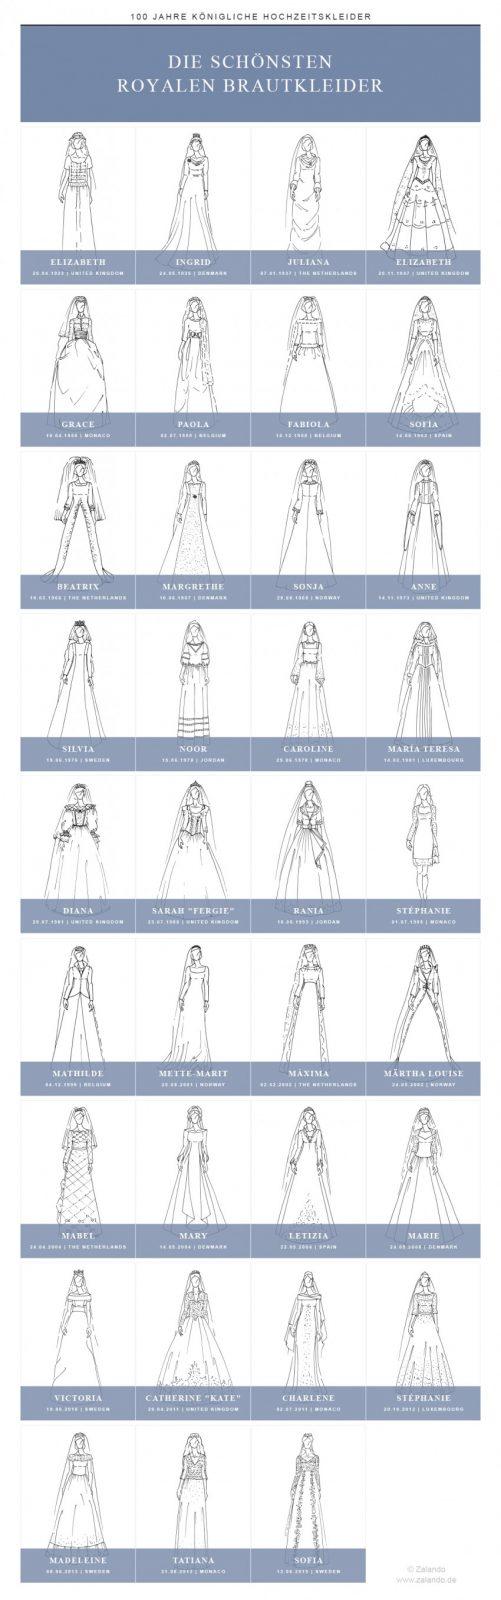 Royal_Wedding_Dresses_Overview_DE